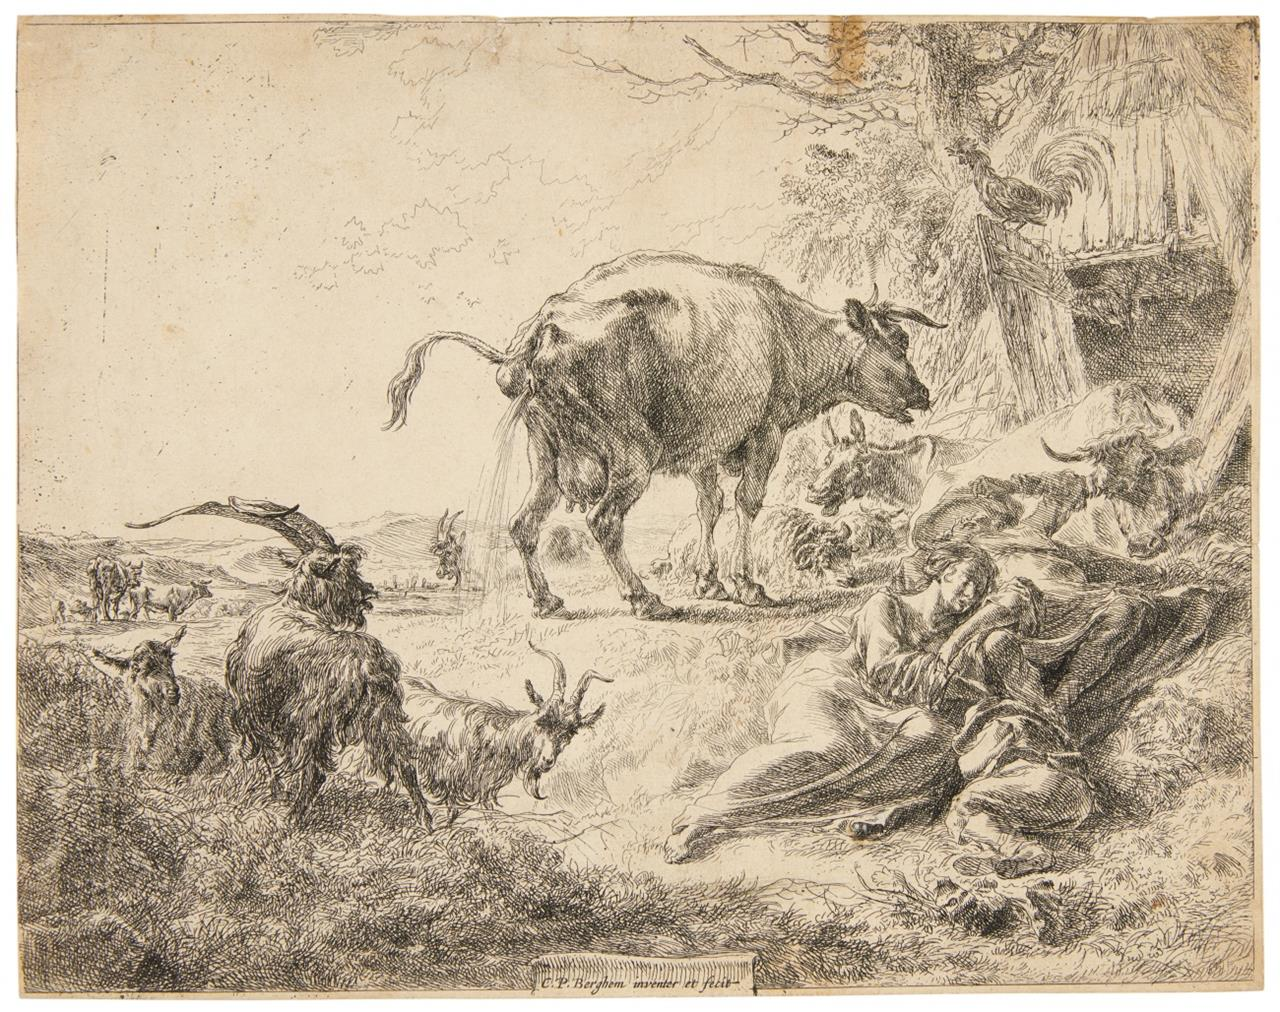 Nicolaes Berchem. Die pissende Kuh. Radierung. H. 2 II.